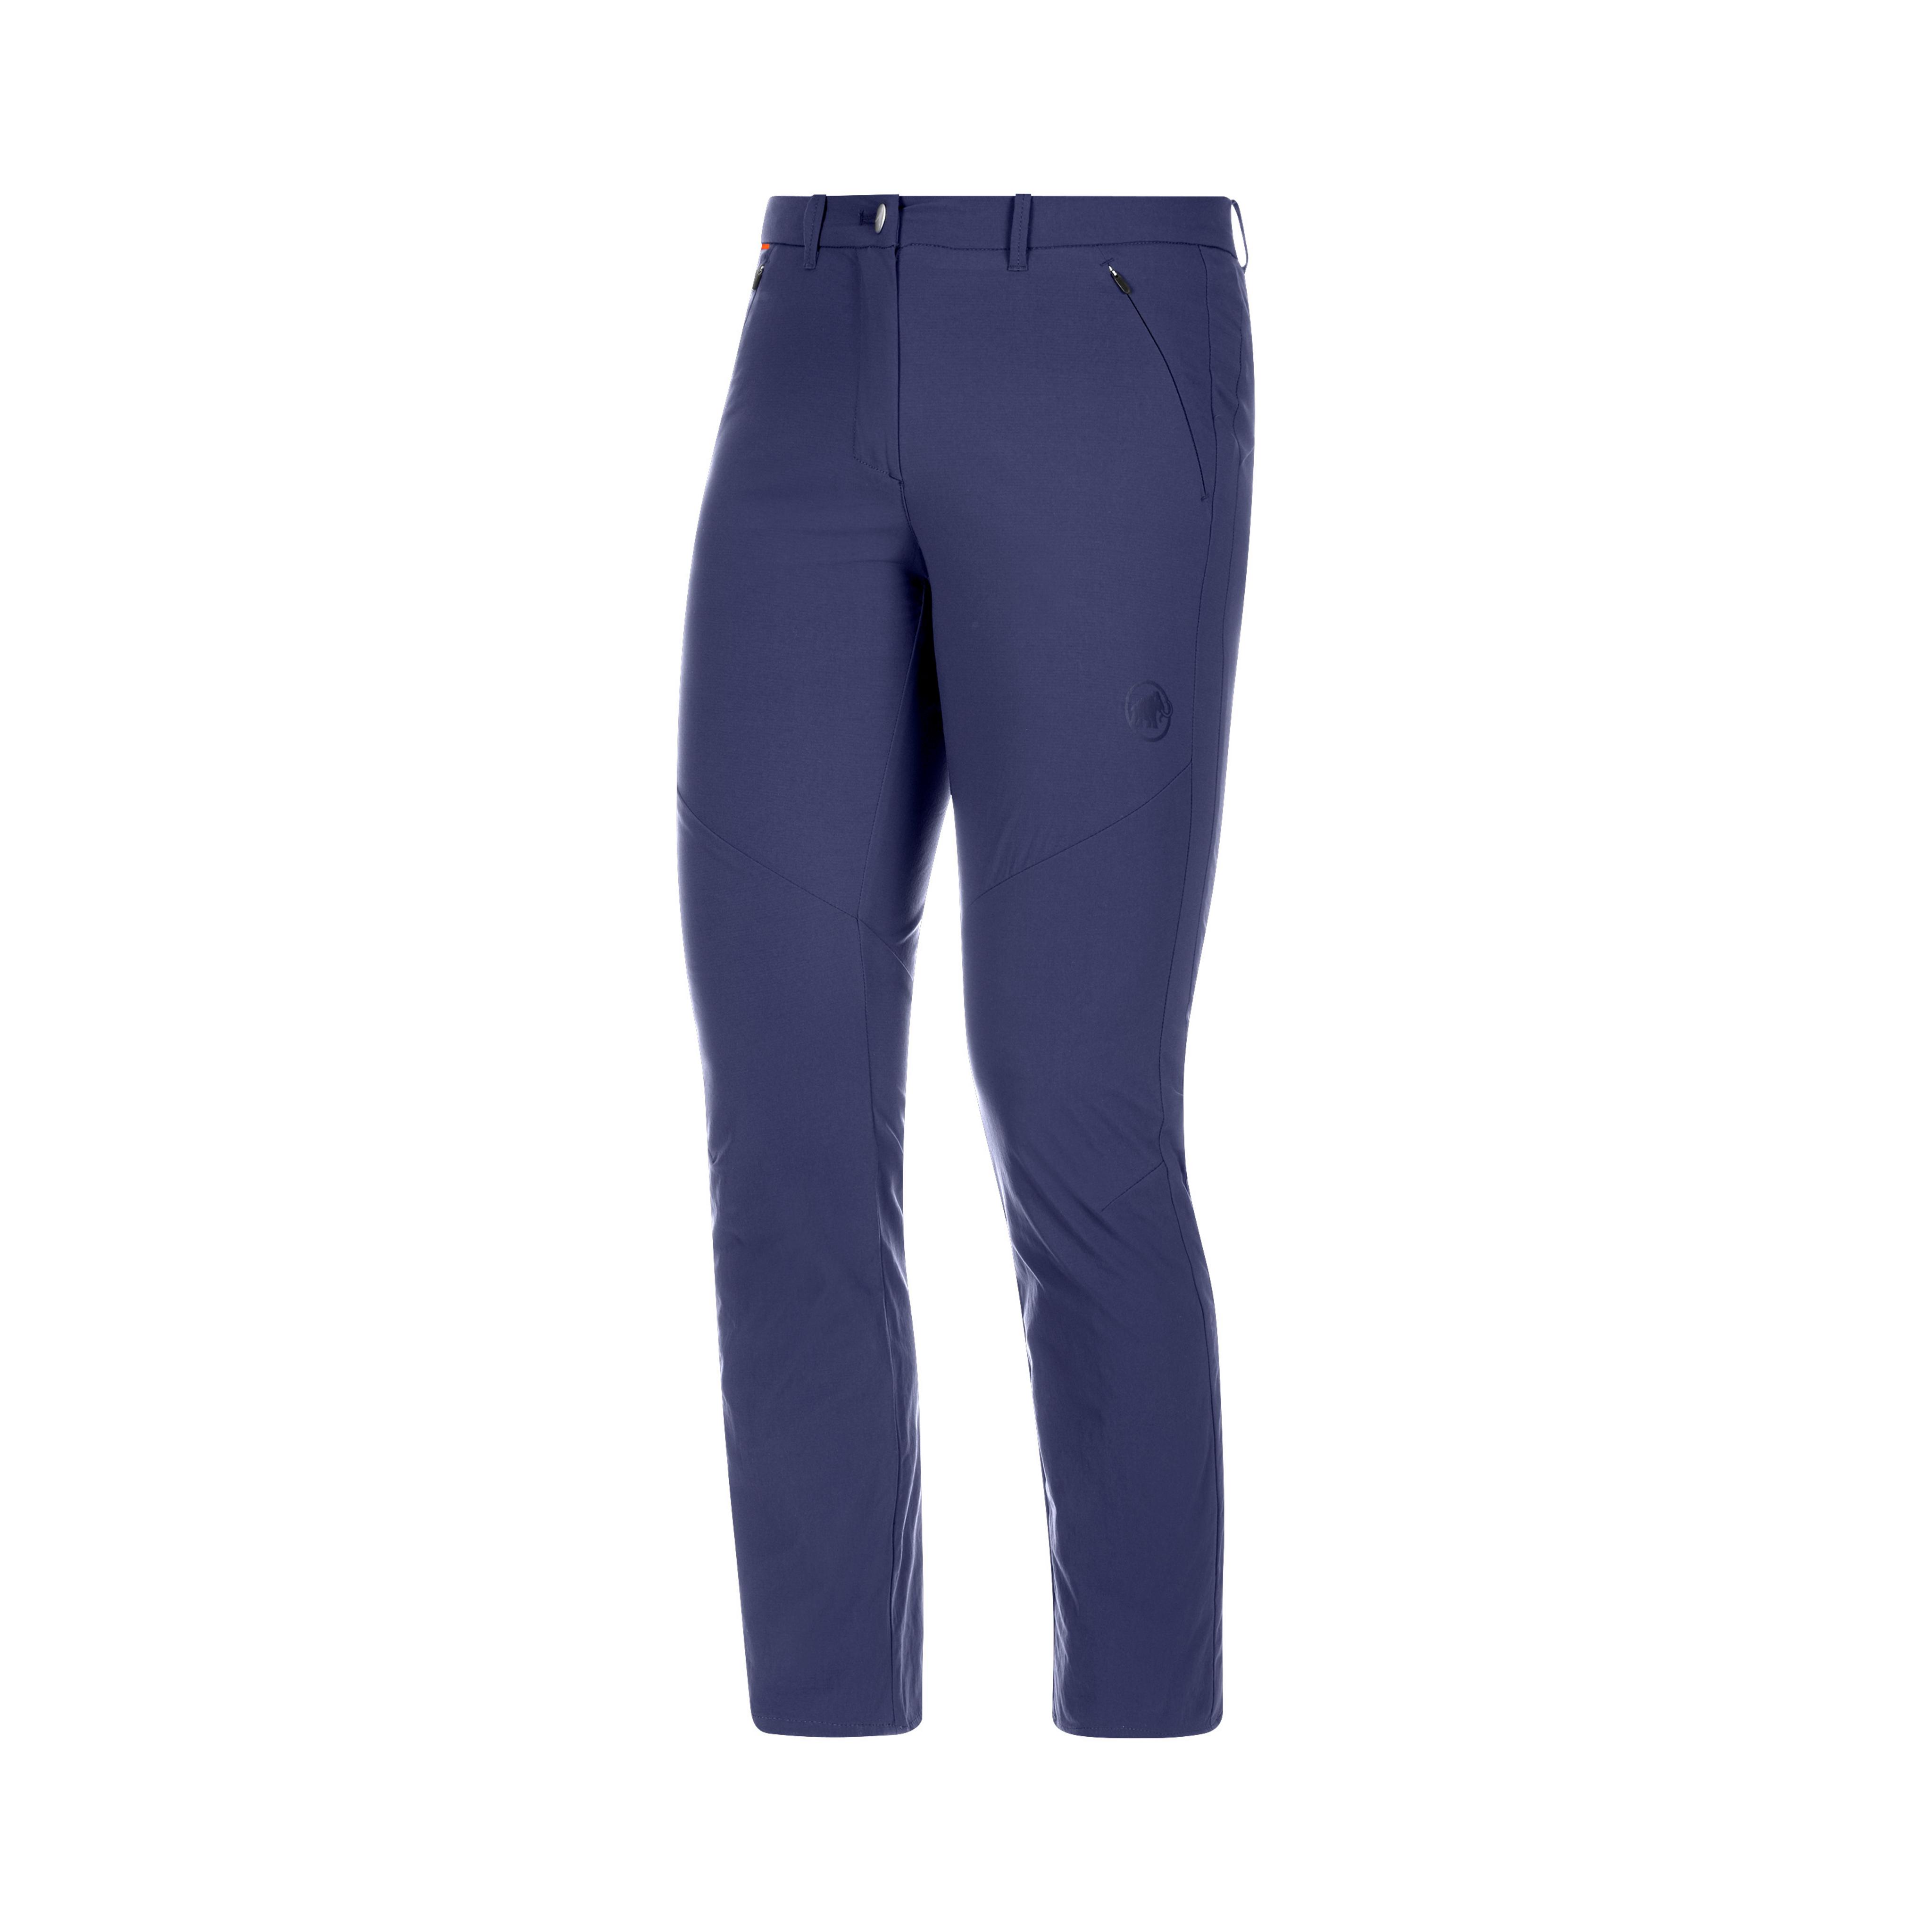 Hiking Pants RG Women - normal, peacoat, UK 6 thumbnail